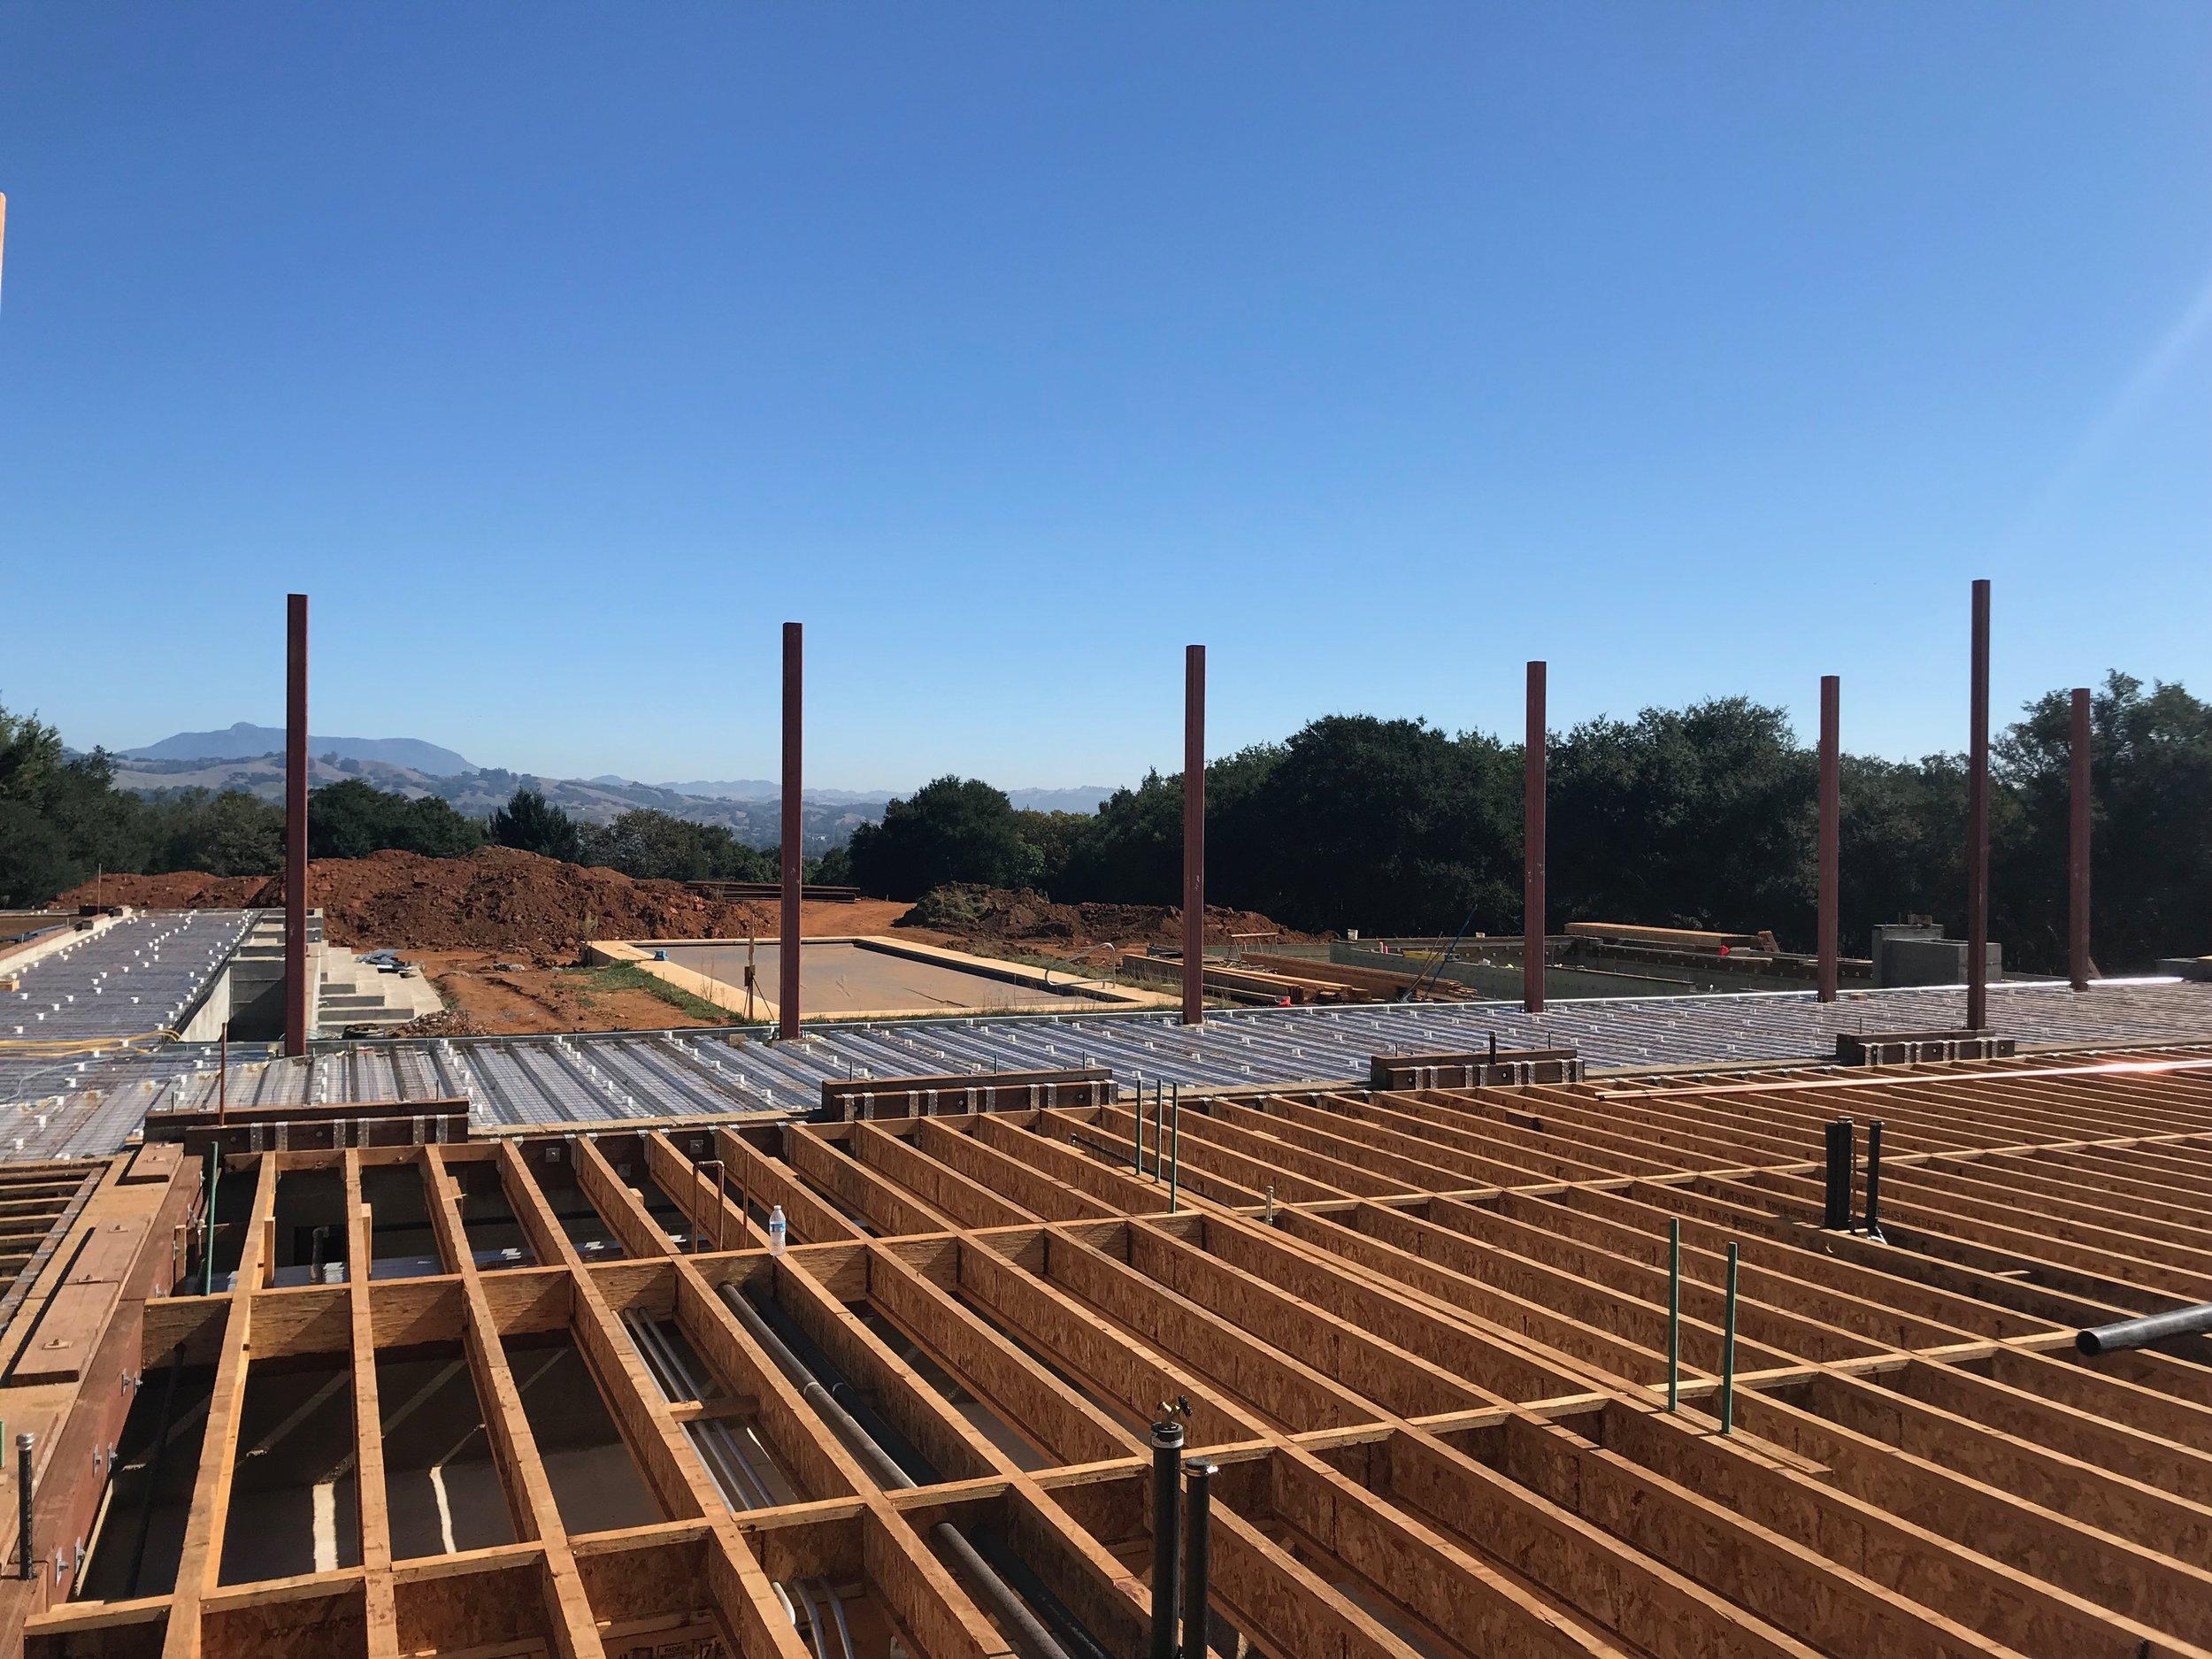 New Estate Construction - Healdsburg, Sonoma County